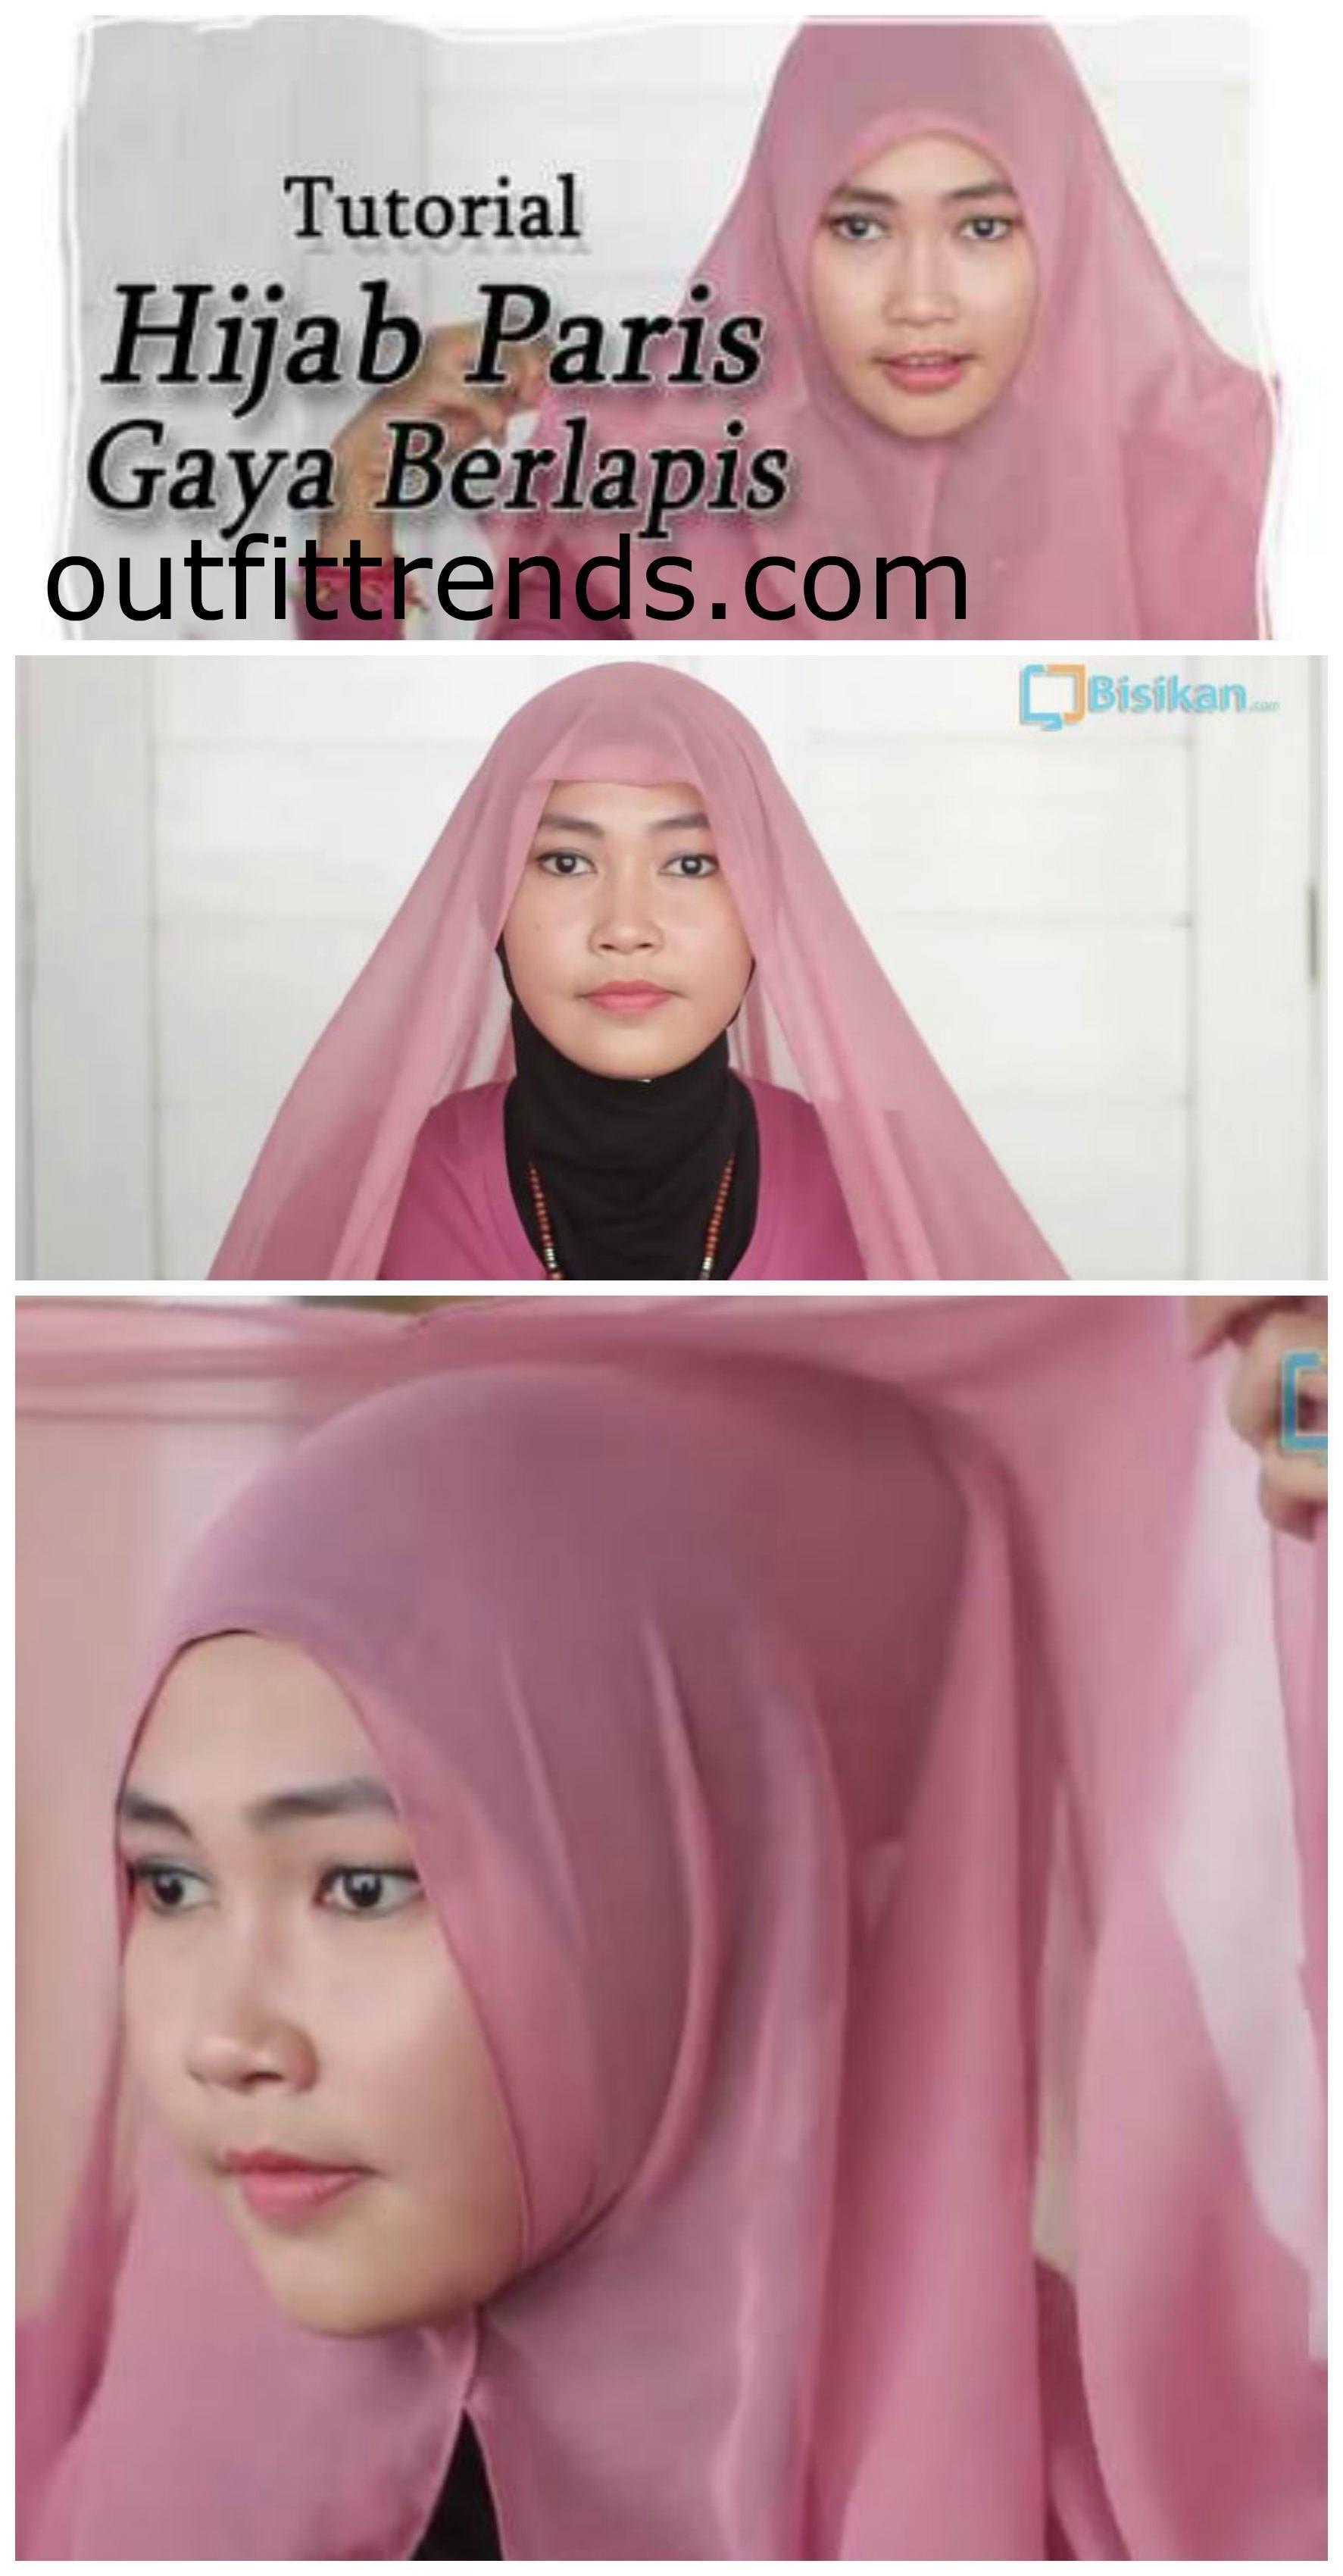 22 Gambar Lengkap Tutorial Hijab Ijab Kabul Paling Fenomenal